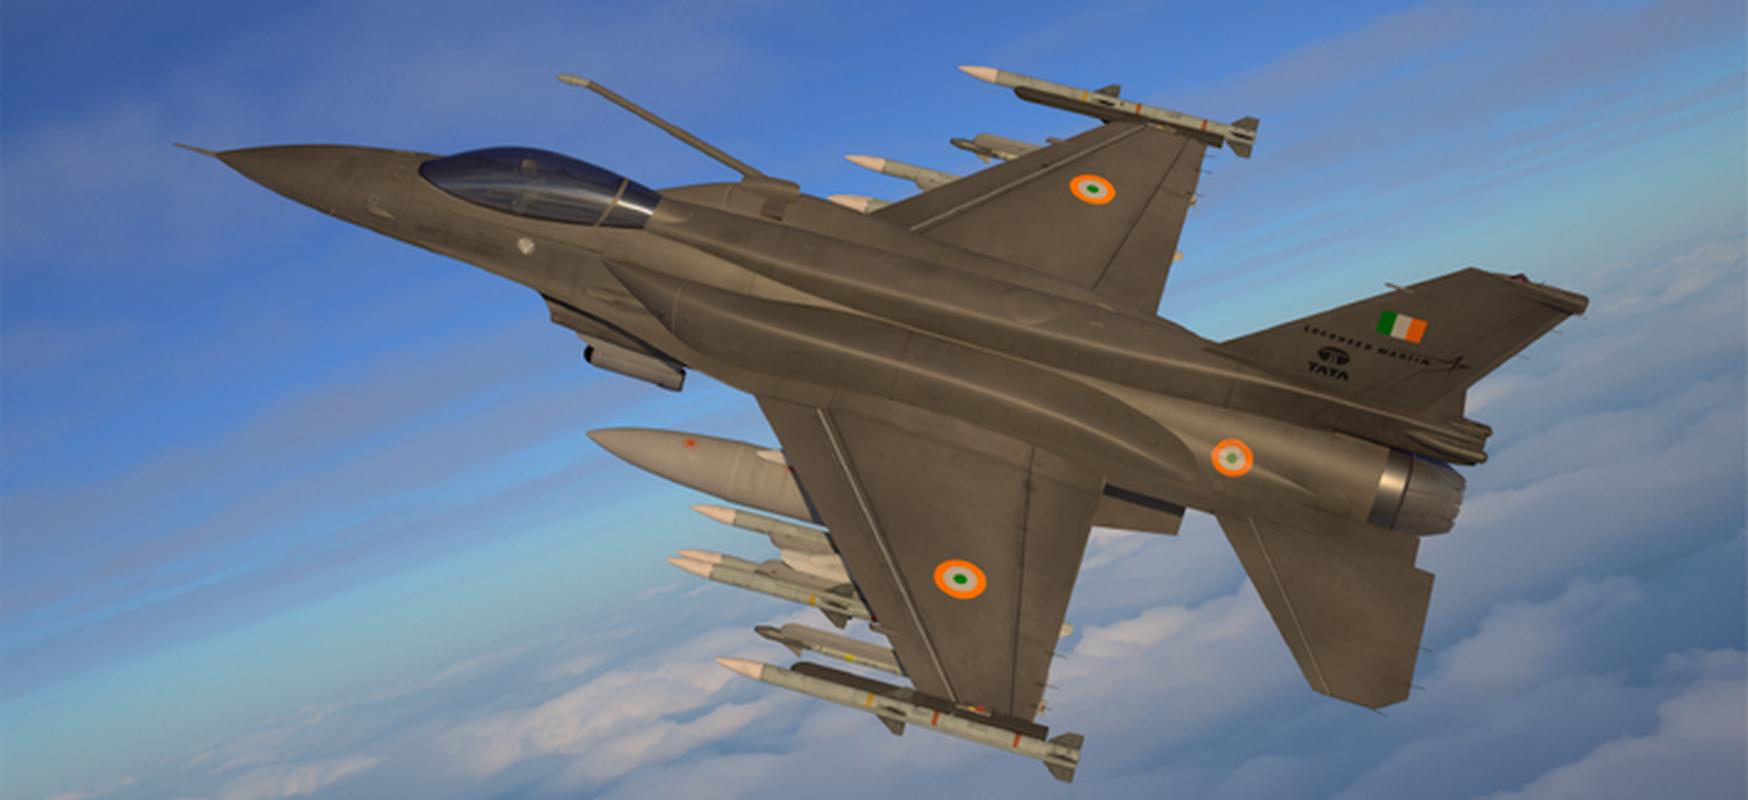 Ngo ngang dien mao sieu tiem kich F-21 My dang rao ban-Hinh-3